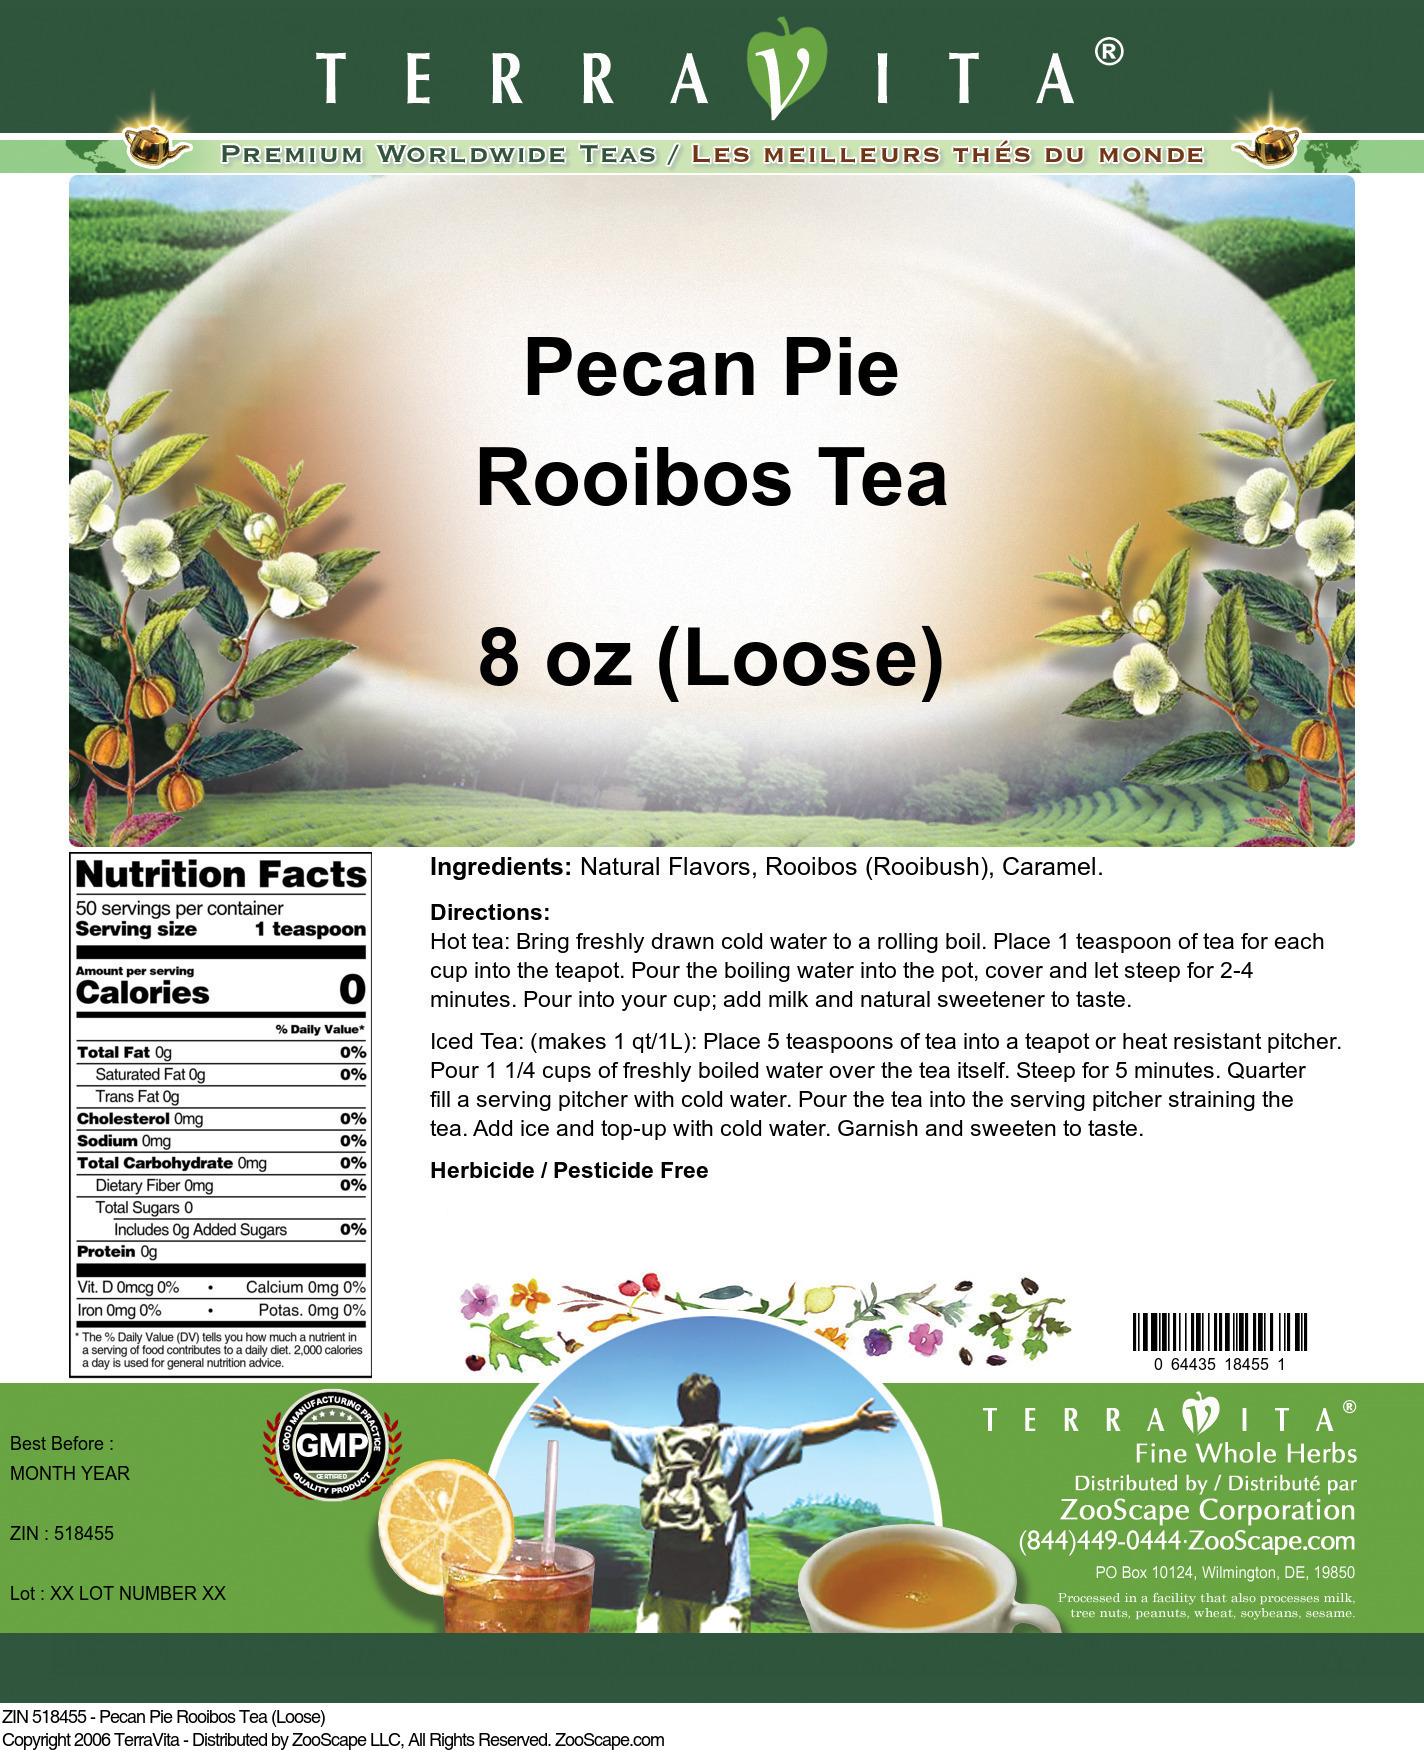 Pecan Pie Rooibos Tea